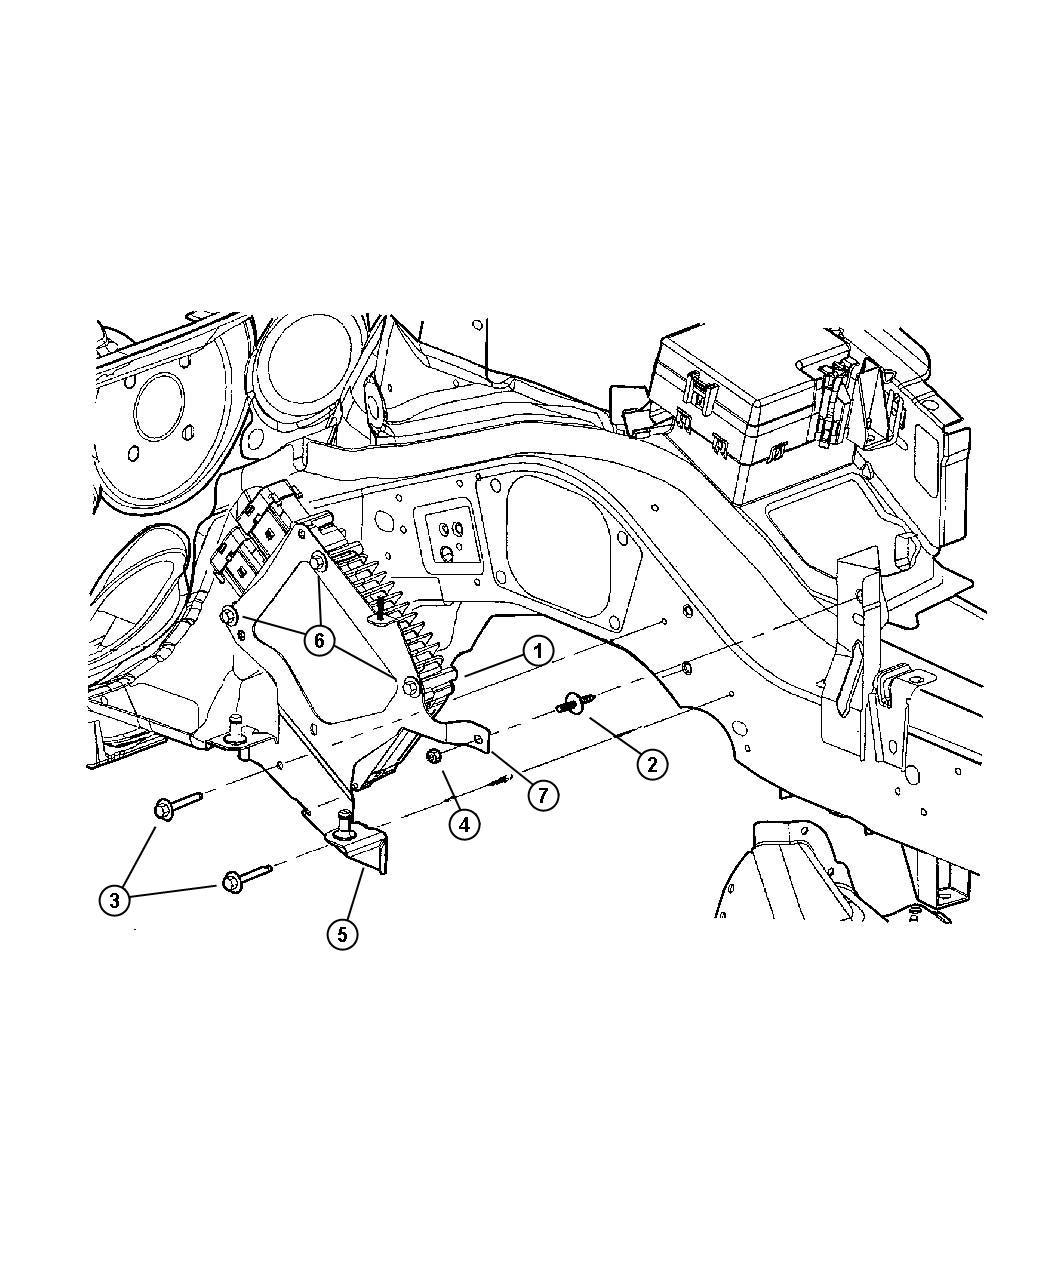 2003 Chrysler Sebring Engine Control Modules [2.0L I4 DOHC